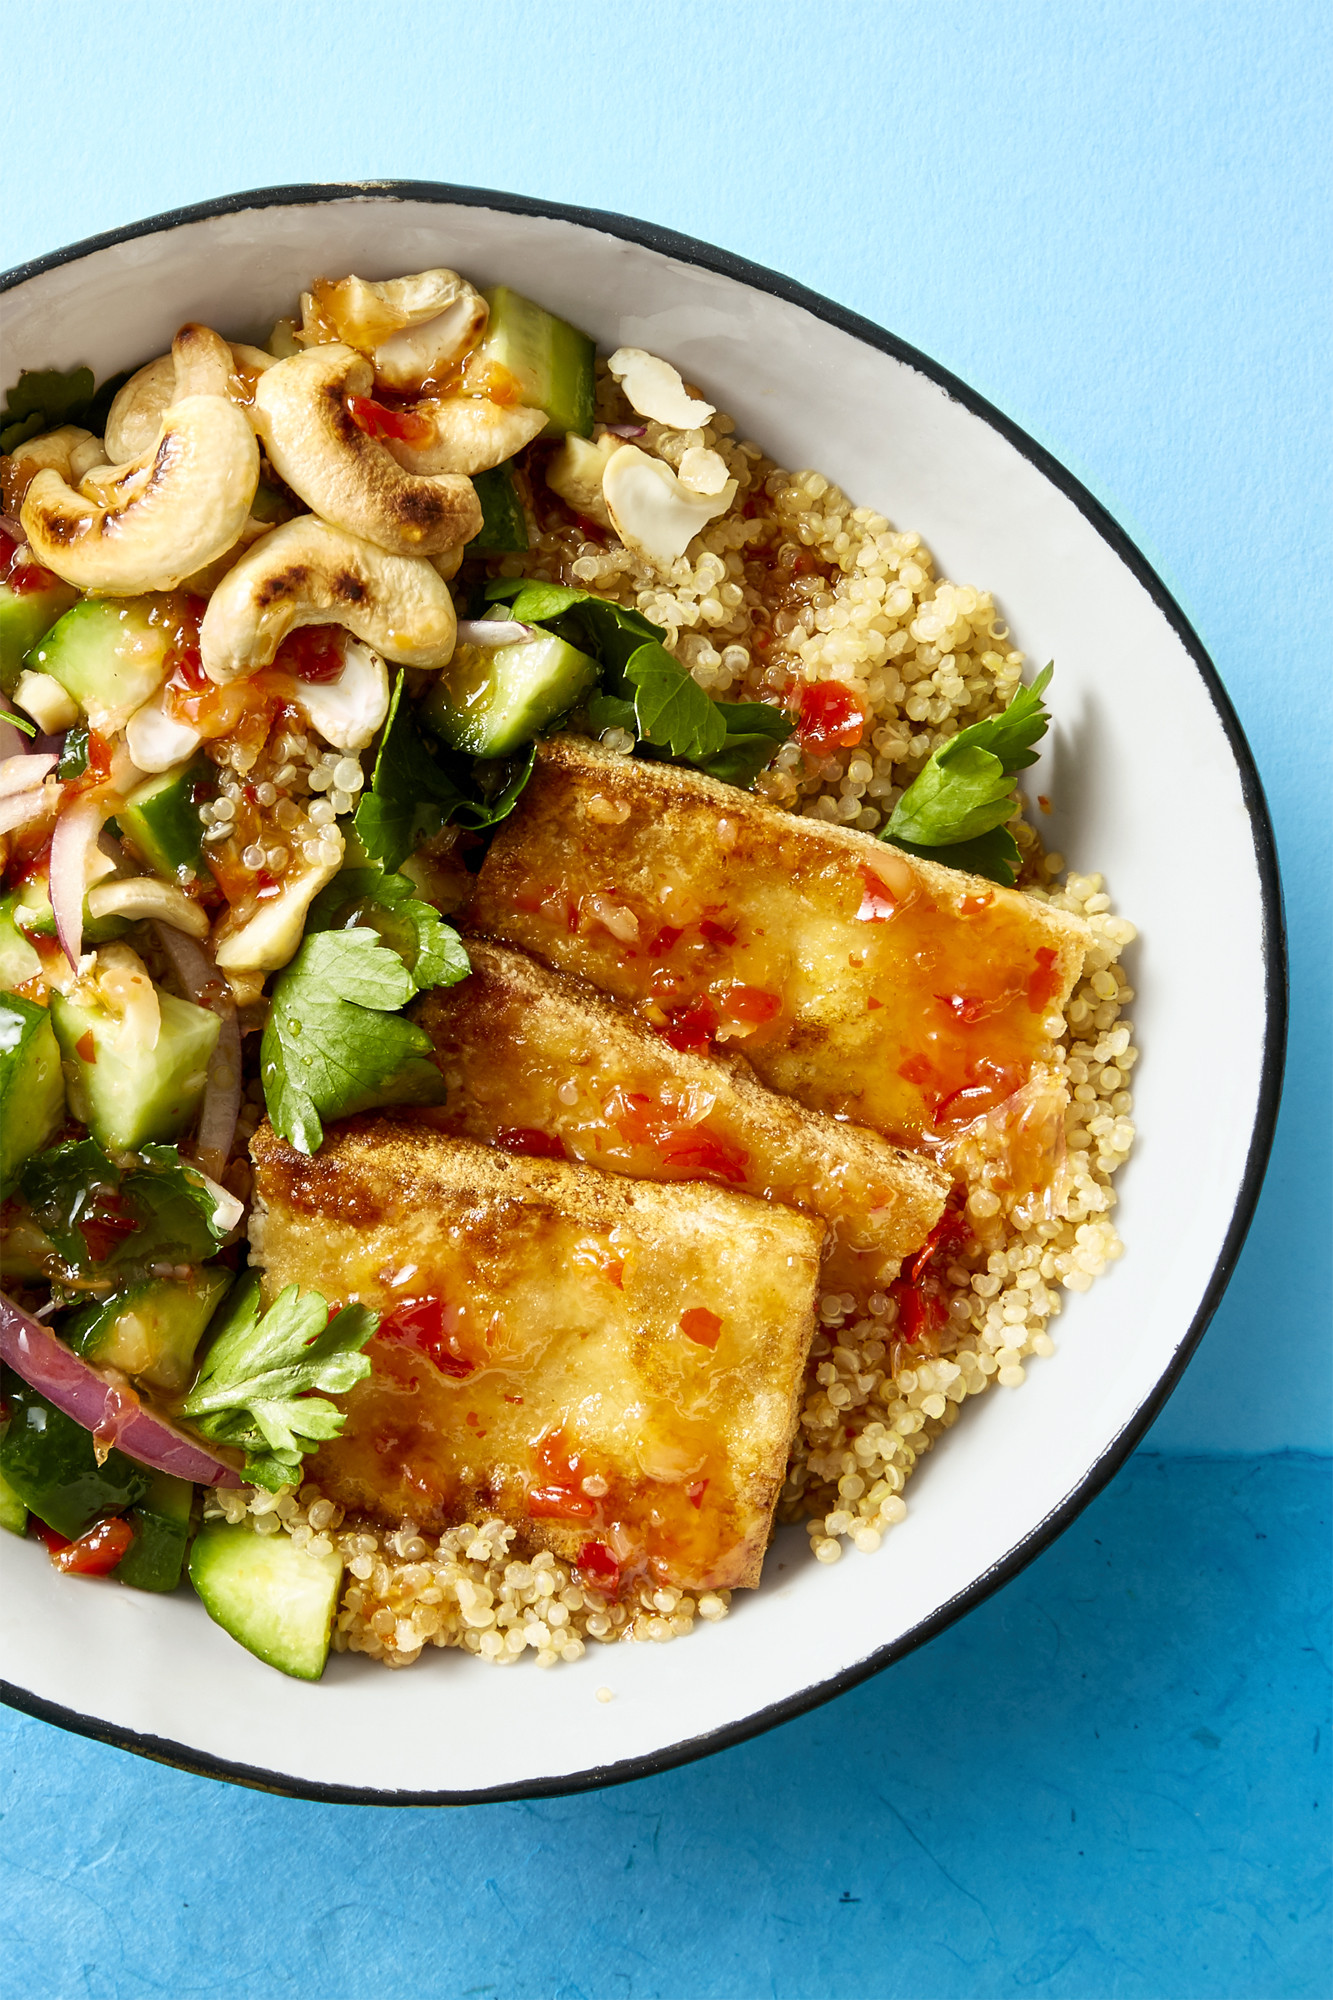 Easy Vegan Dinner  Best Crispy Tofu Bowl Recipe How to Make Crispy Tofu Bowl